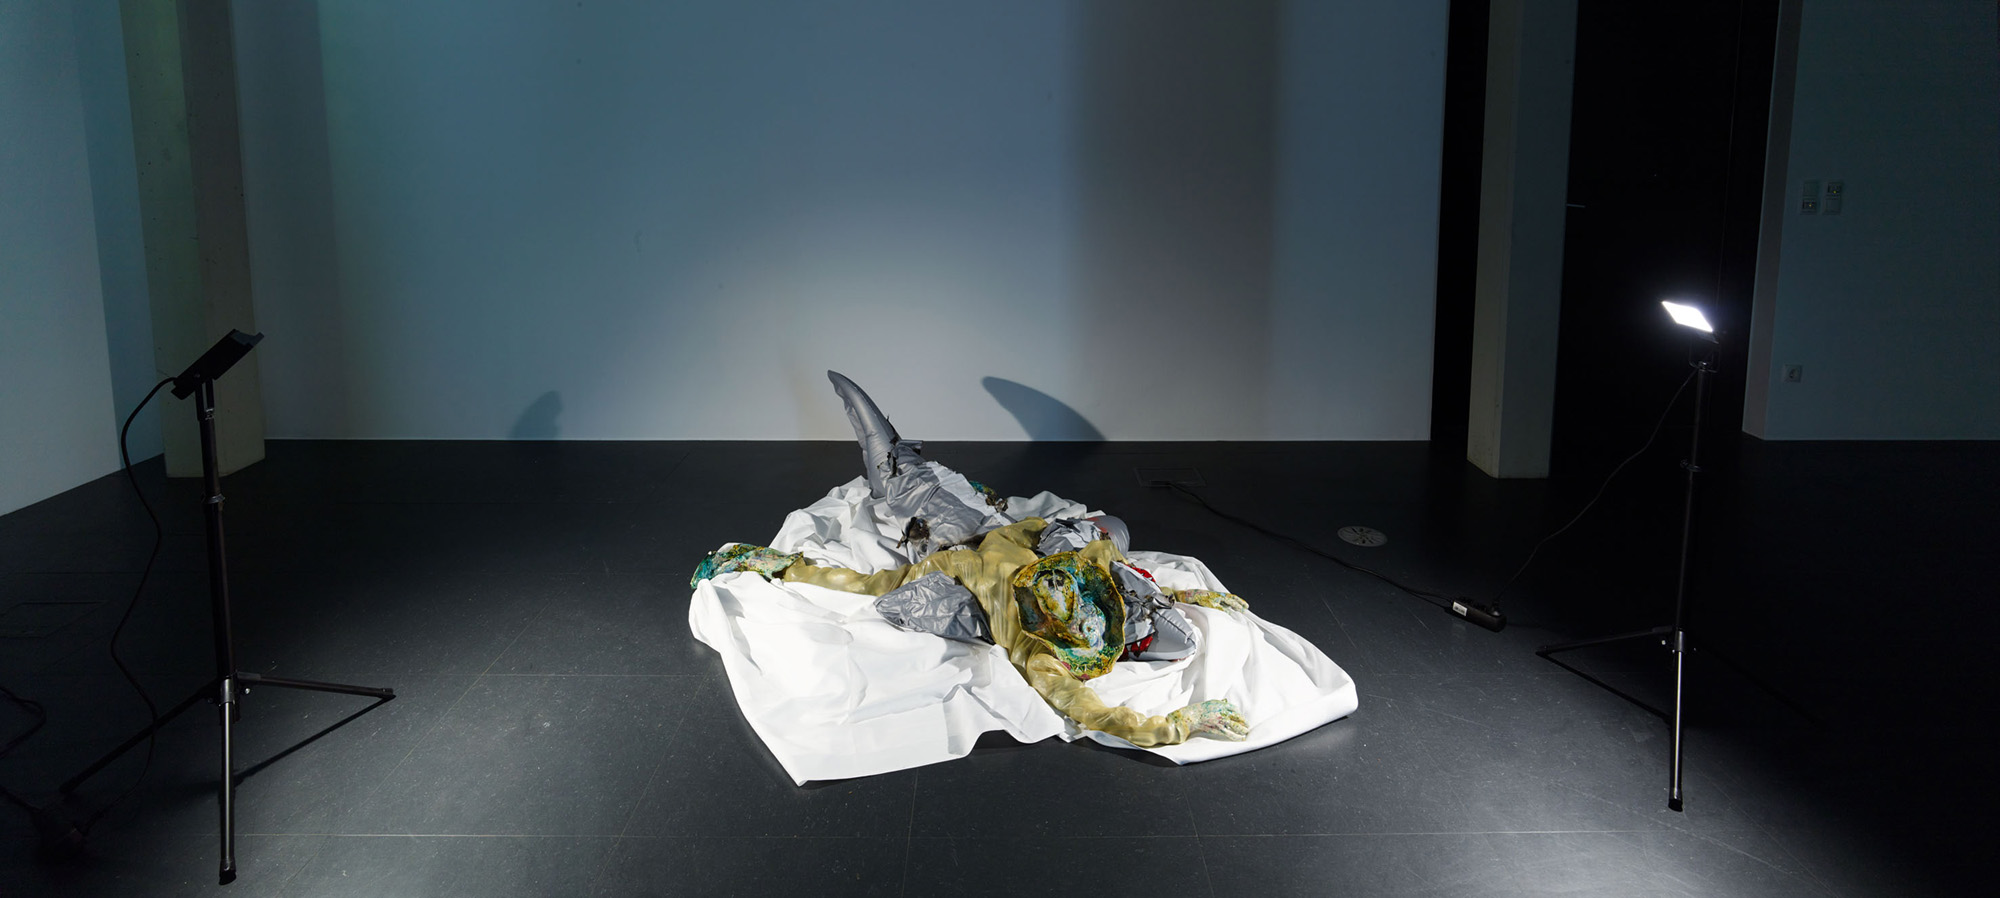 Kris Lemsalu — Afternoon Tear Drinker, Kunstraum Lakeside | Foto: Johannes Puch